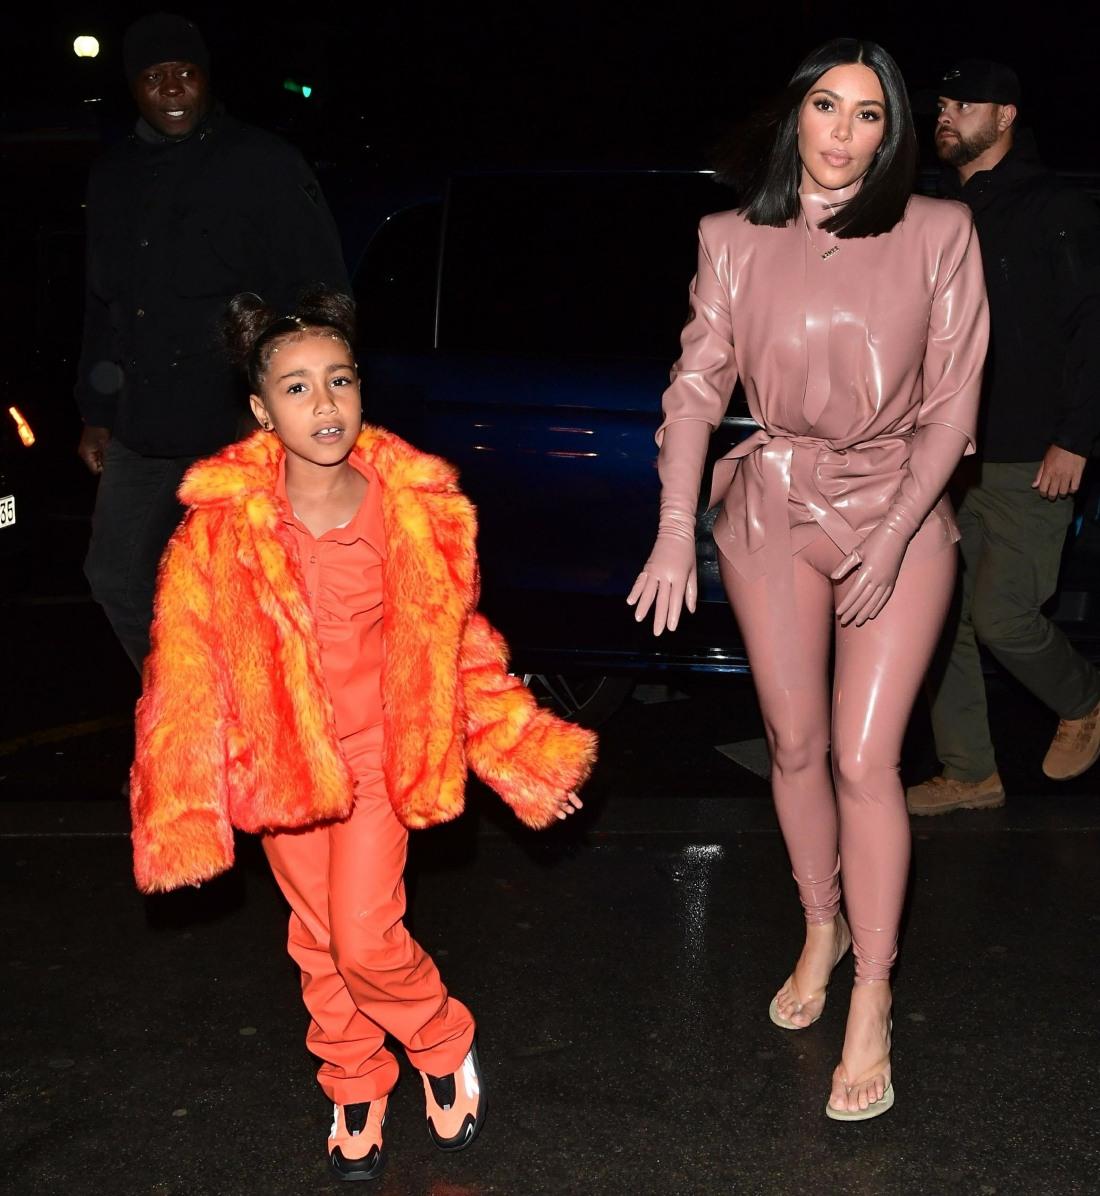 Kanye West, Kim Kardashian and Kourtney Kardashian take their kids to the Eiffel Tower